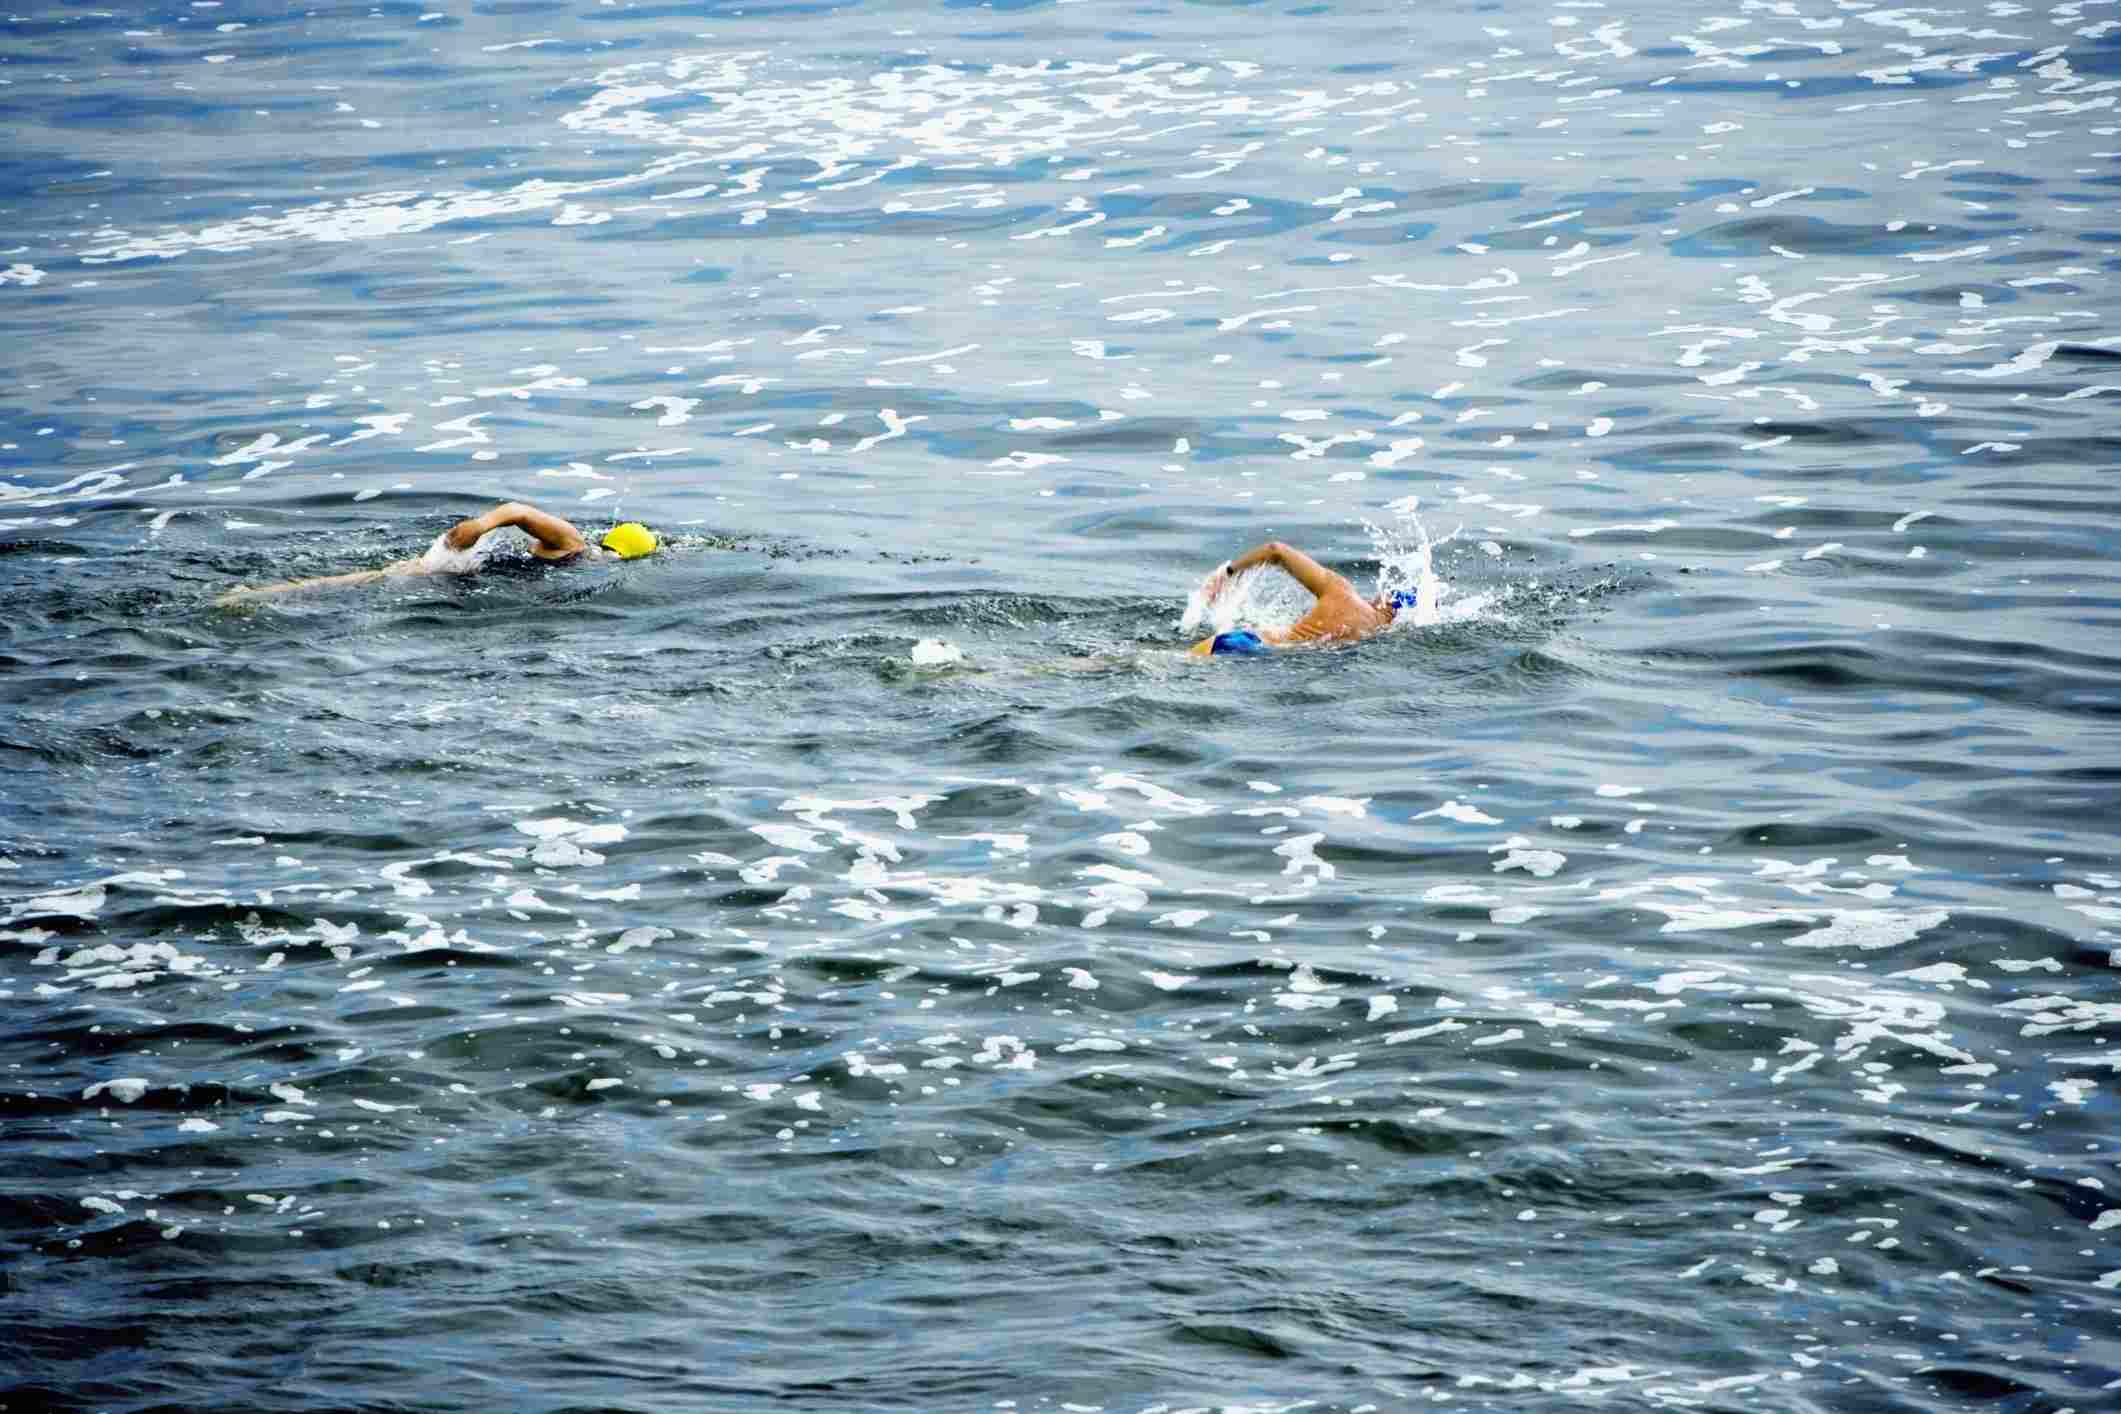 Swimming off the shore of La Jolla in San Diego.